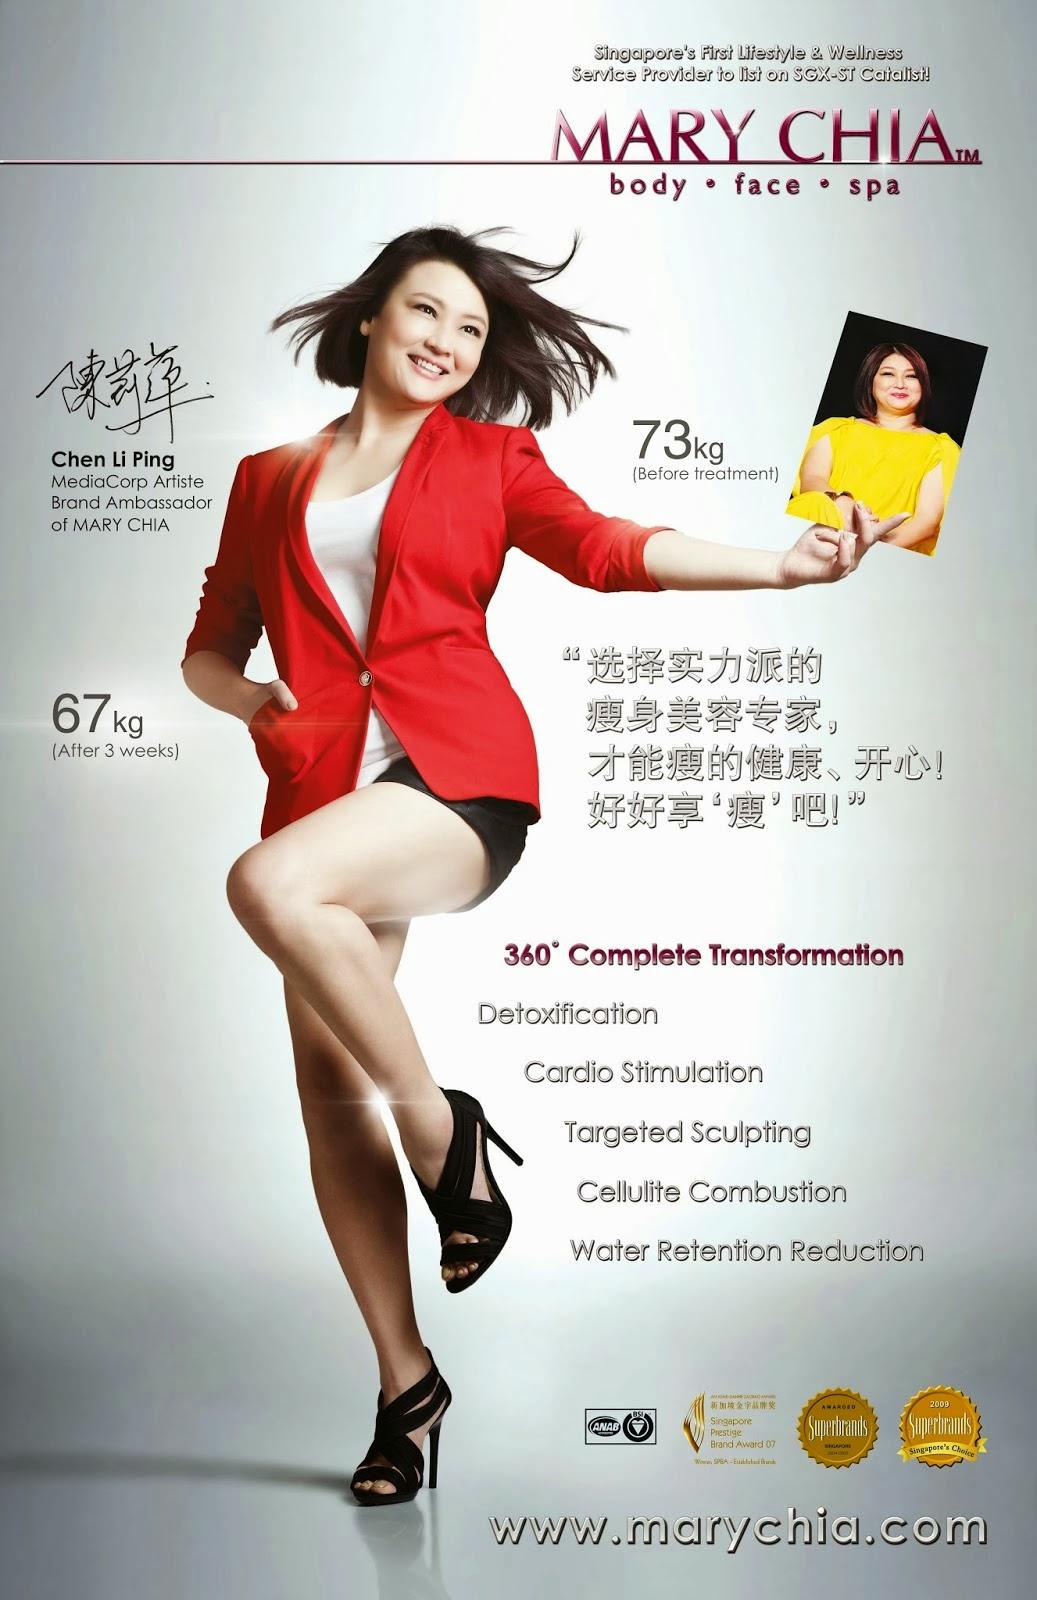 MediaCorp artiste Chen Li Ping (陈莉萍 Chén lì píng) and local beauty and wellness spa Mary Chia